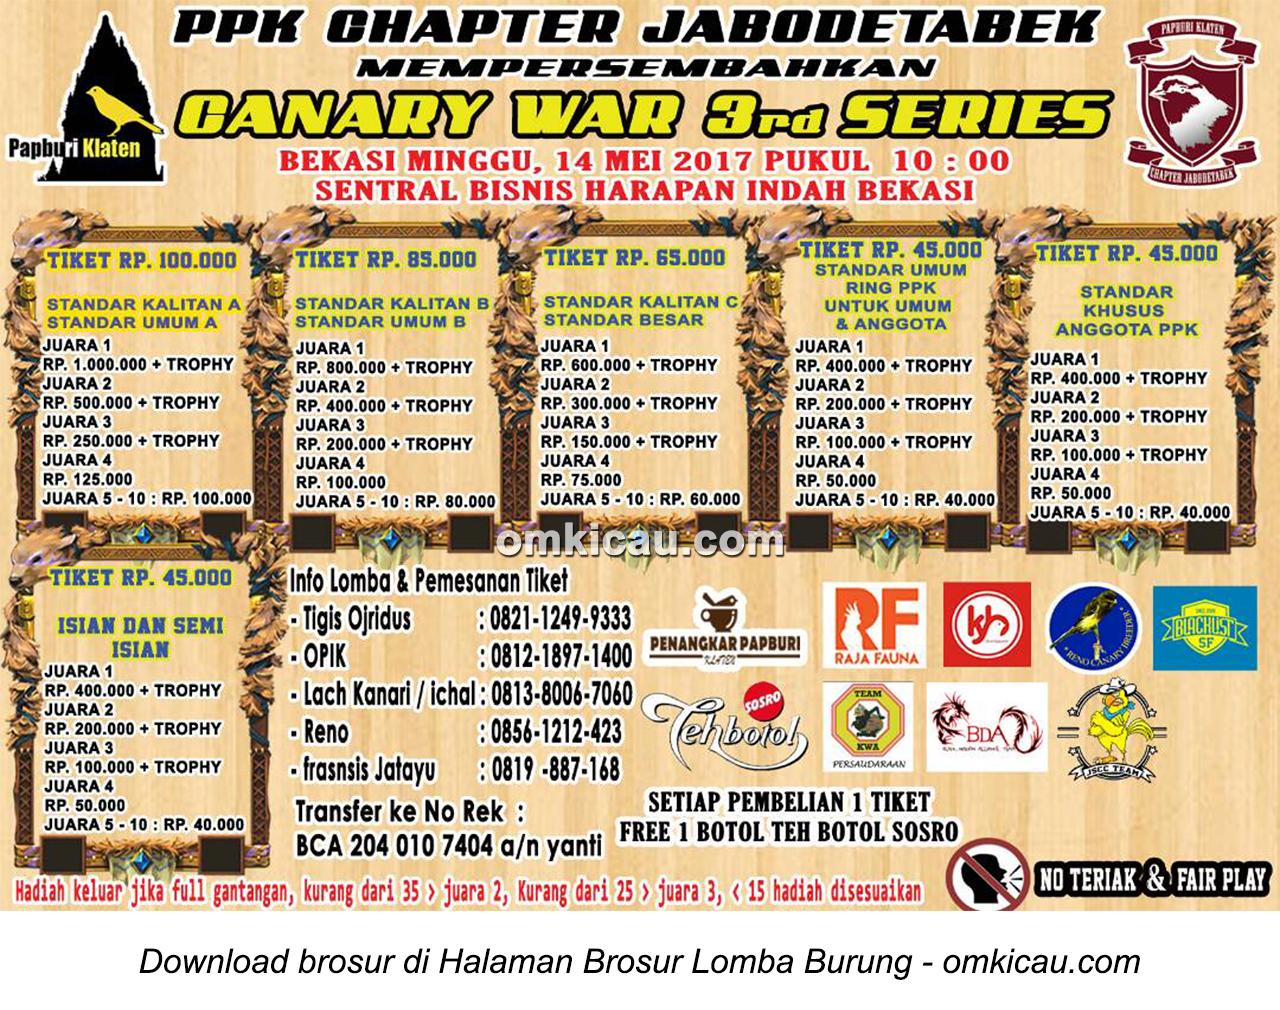 Brosur Canary War 3rd Series - PPK Jabodetabek, Bekasi, 14 Mei 2017